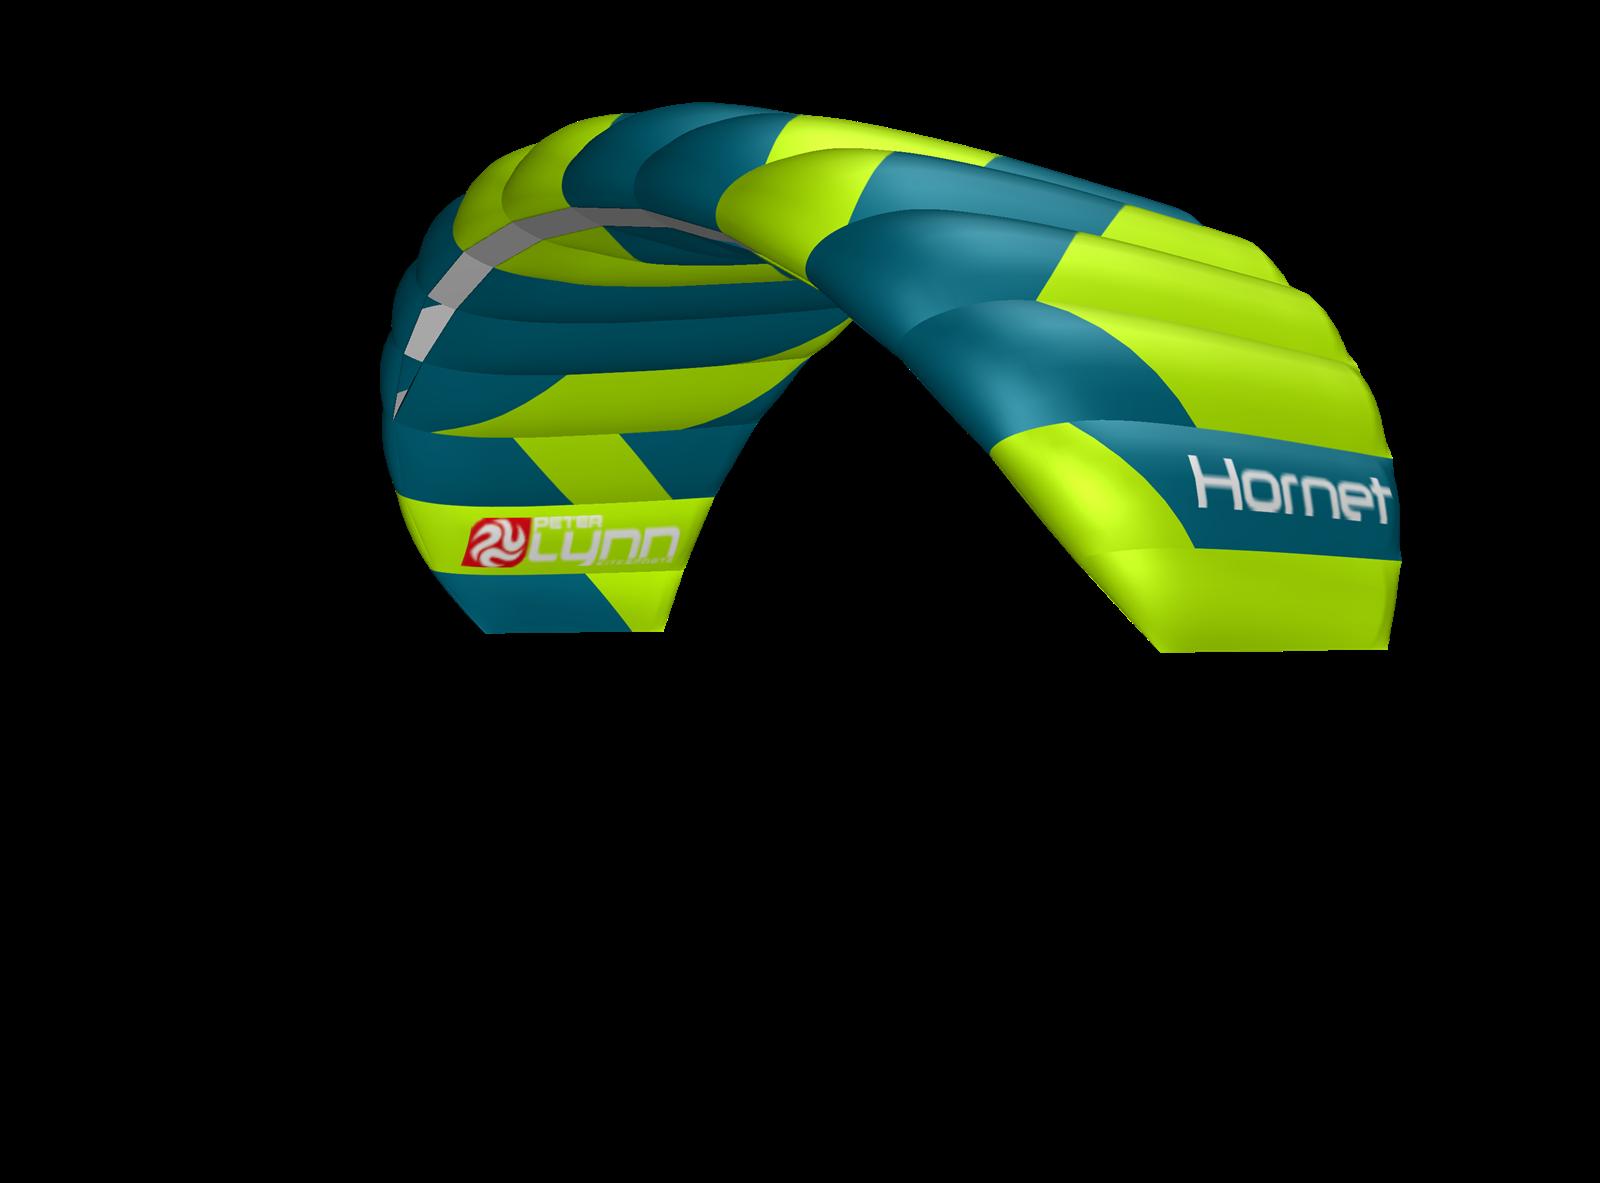 kite 2016 PETER LYNN HORNET 6m2 ručky